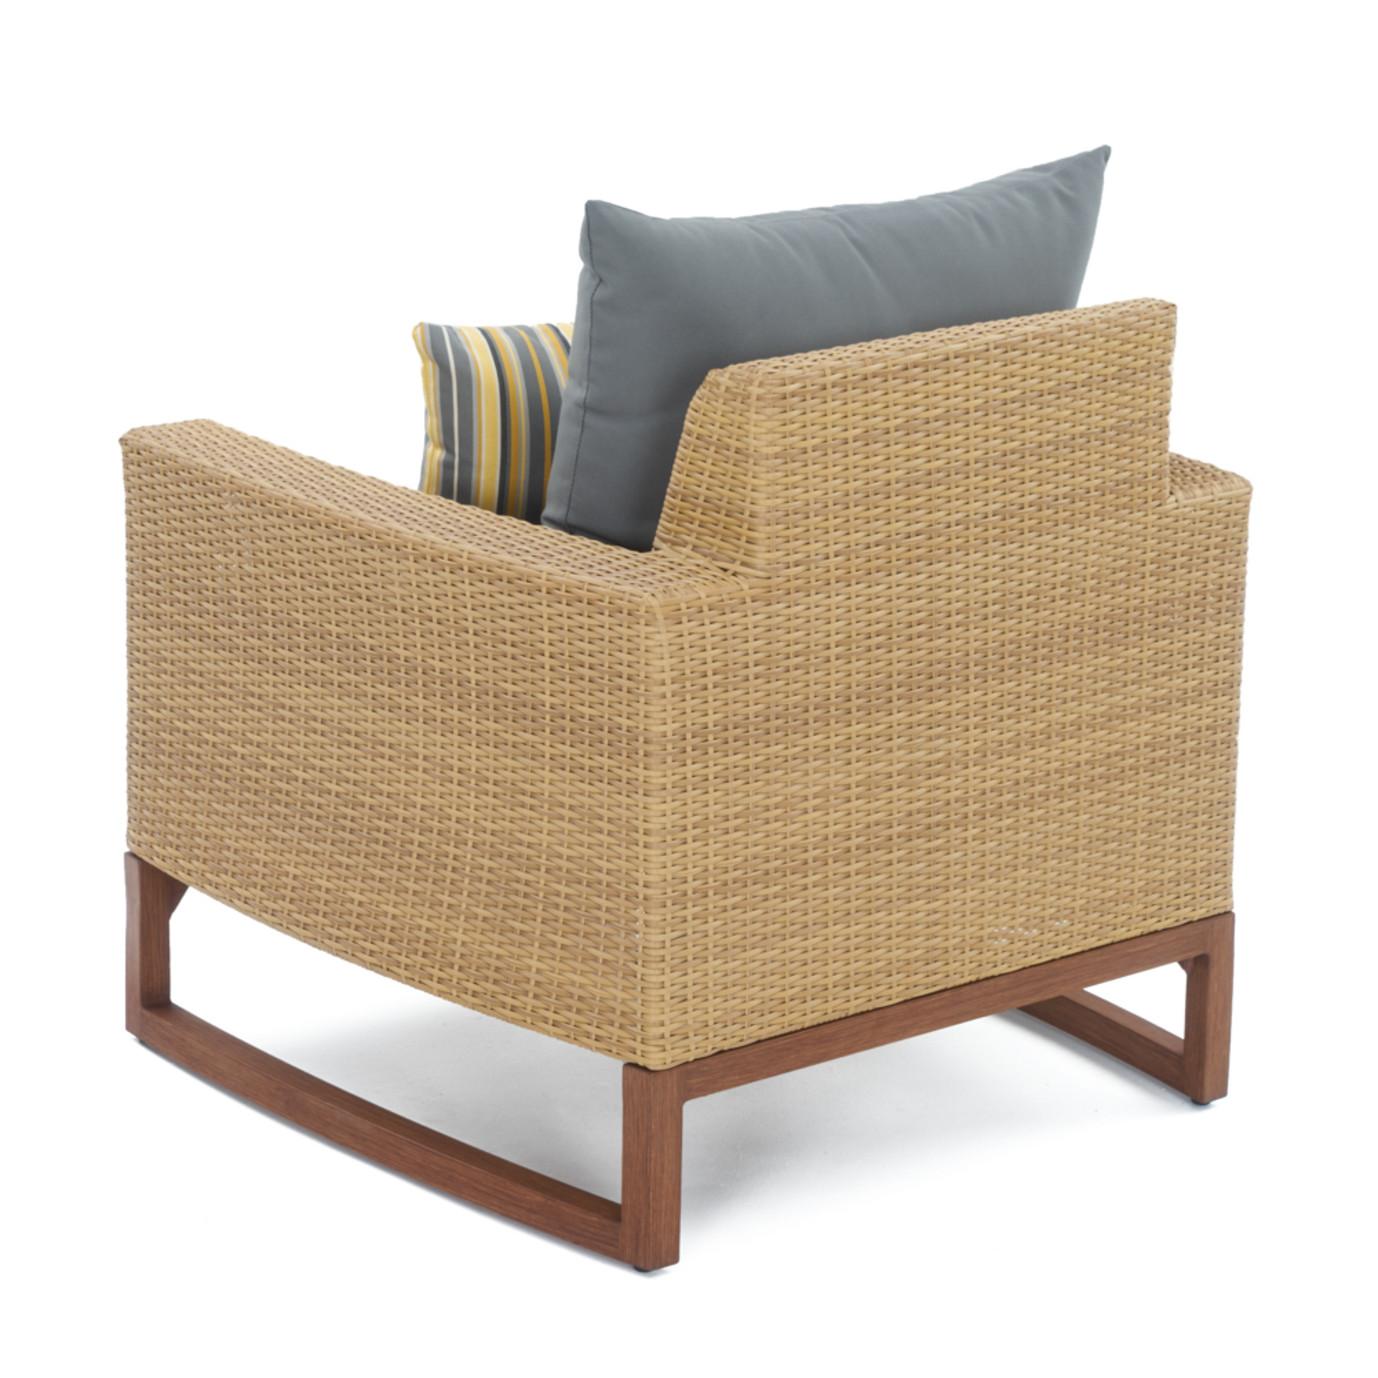 Mili™ 4pc Seating Set - Charcoal Grey